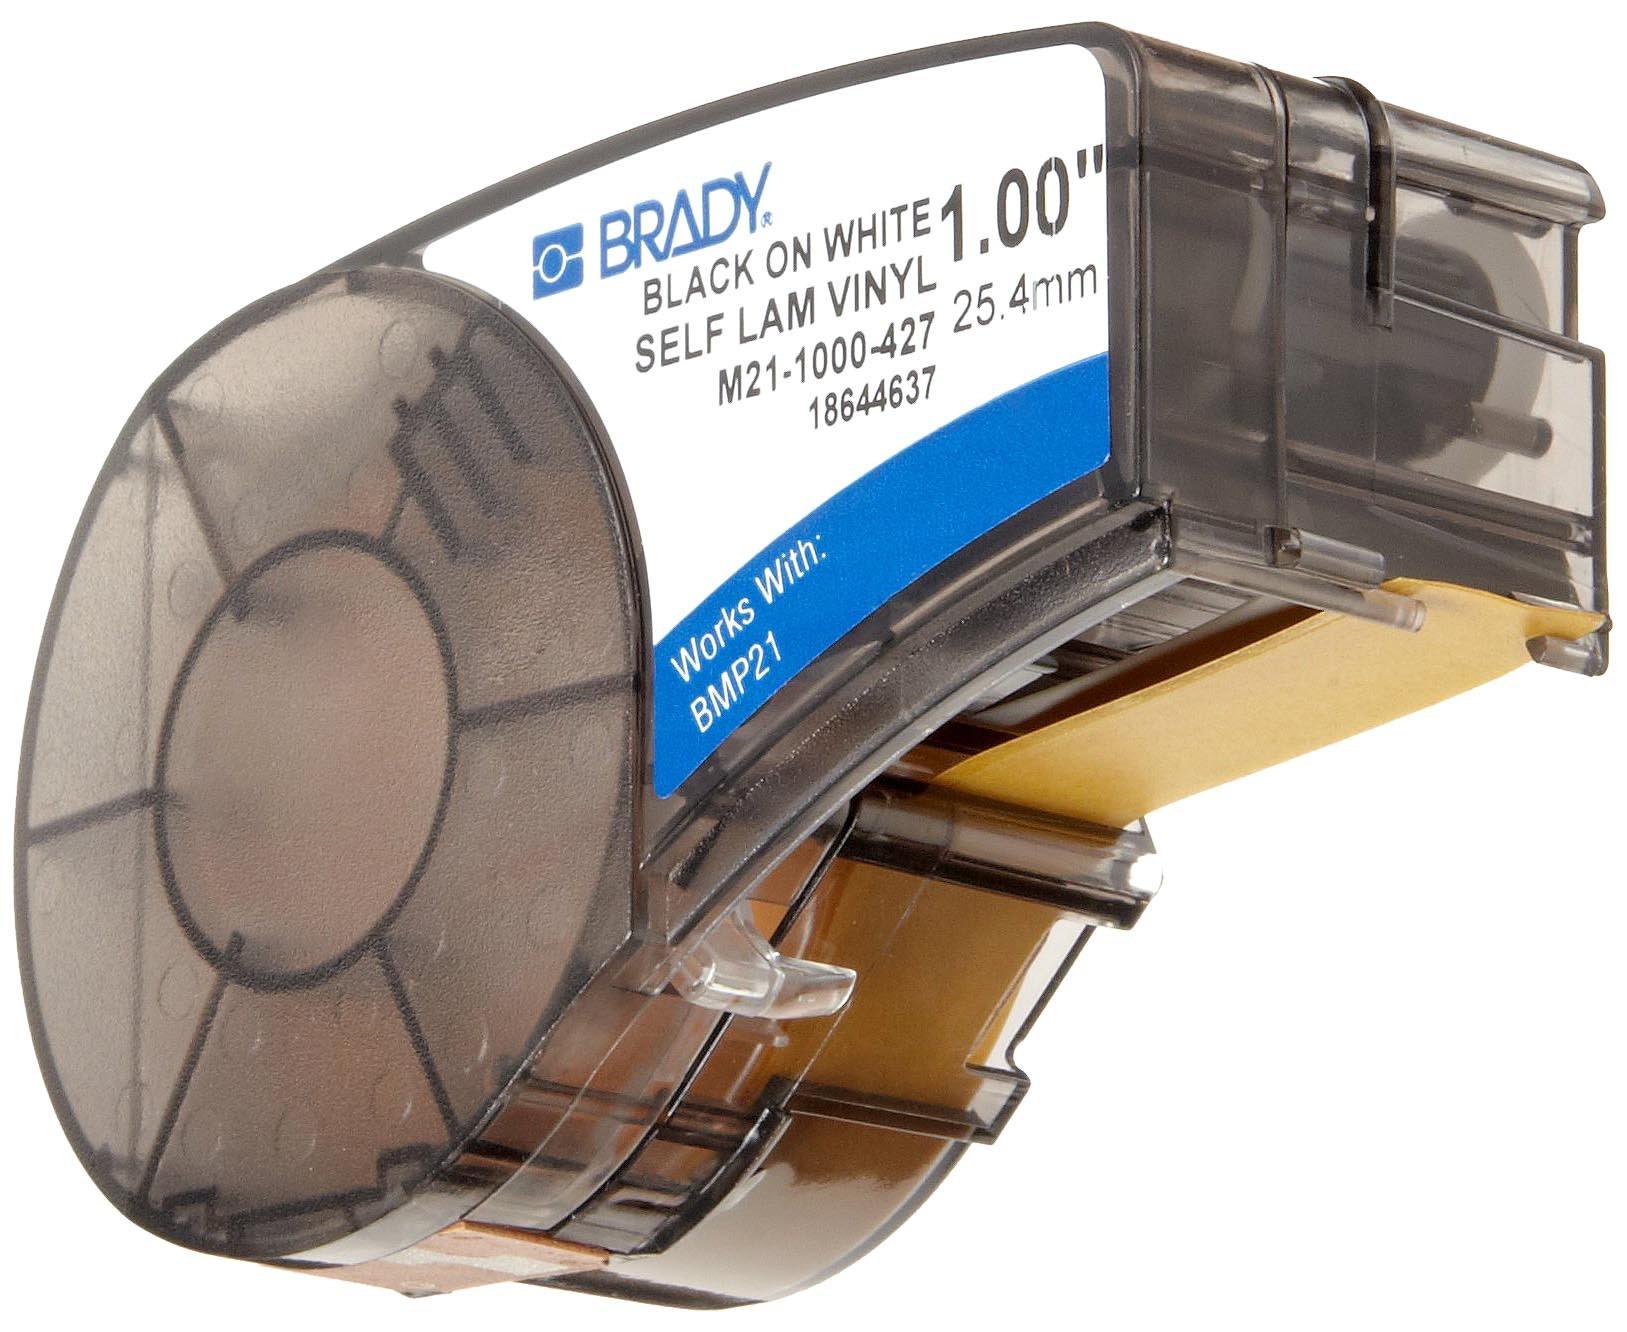 Brady Self-Laminating Vinyl Label Tape (M21-1000-427) - Black on White, Translucent Tape - Compatible with BMP21-PLUS Label Printer - 14' Length, 1'' Width